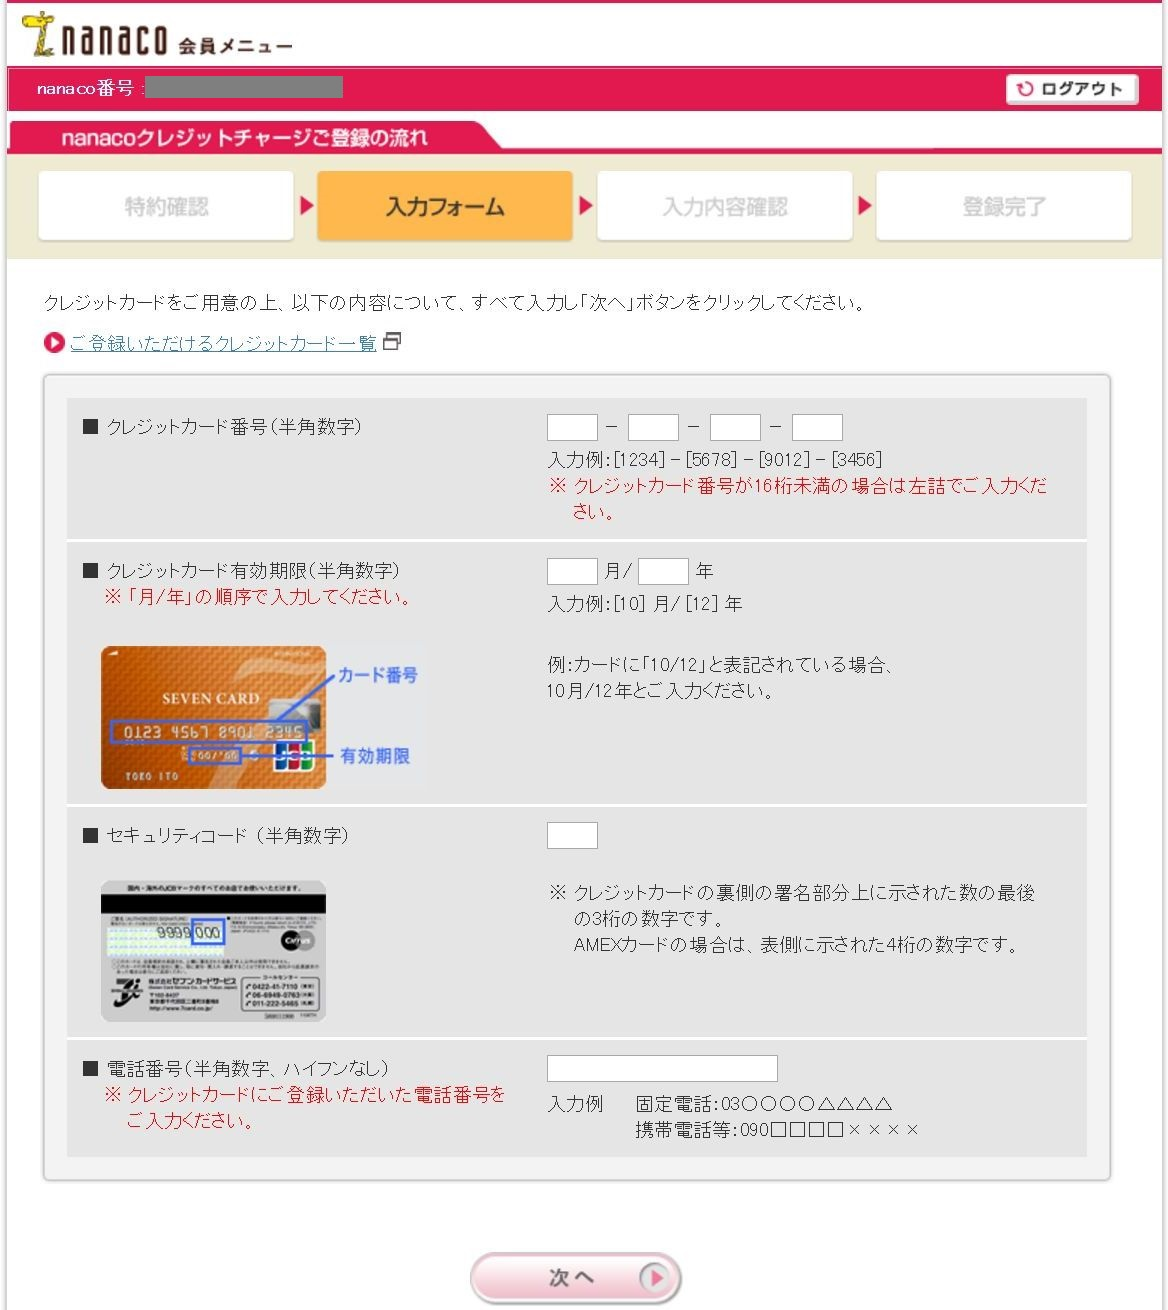 nanacoクレジットチャージ登録の入力フォーム画面1